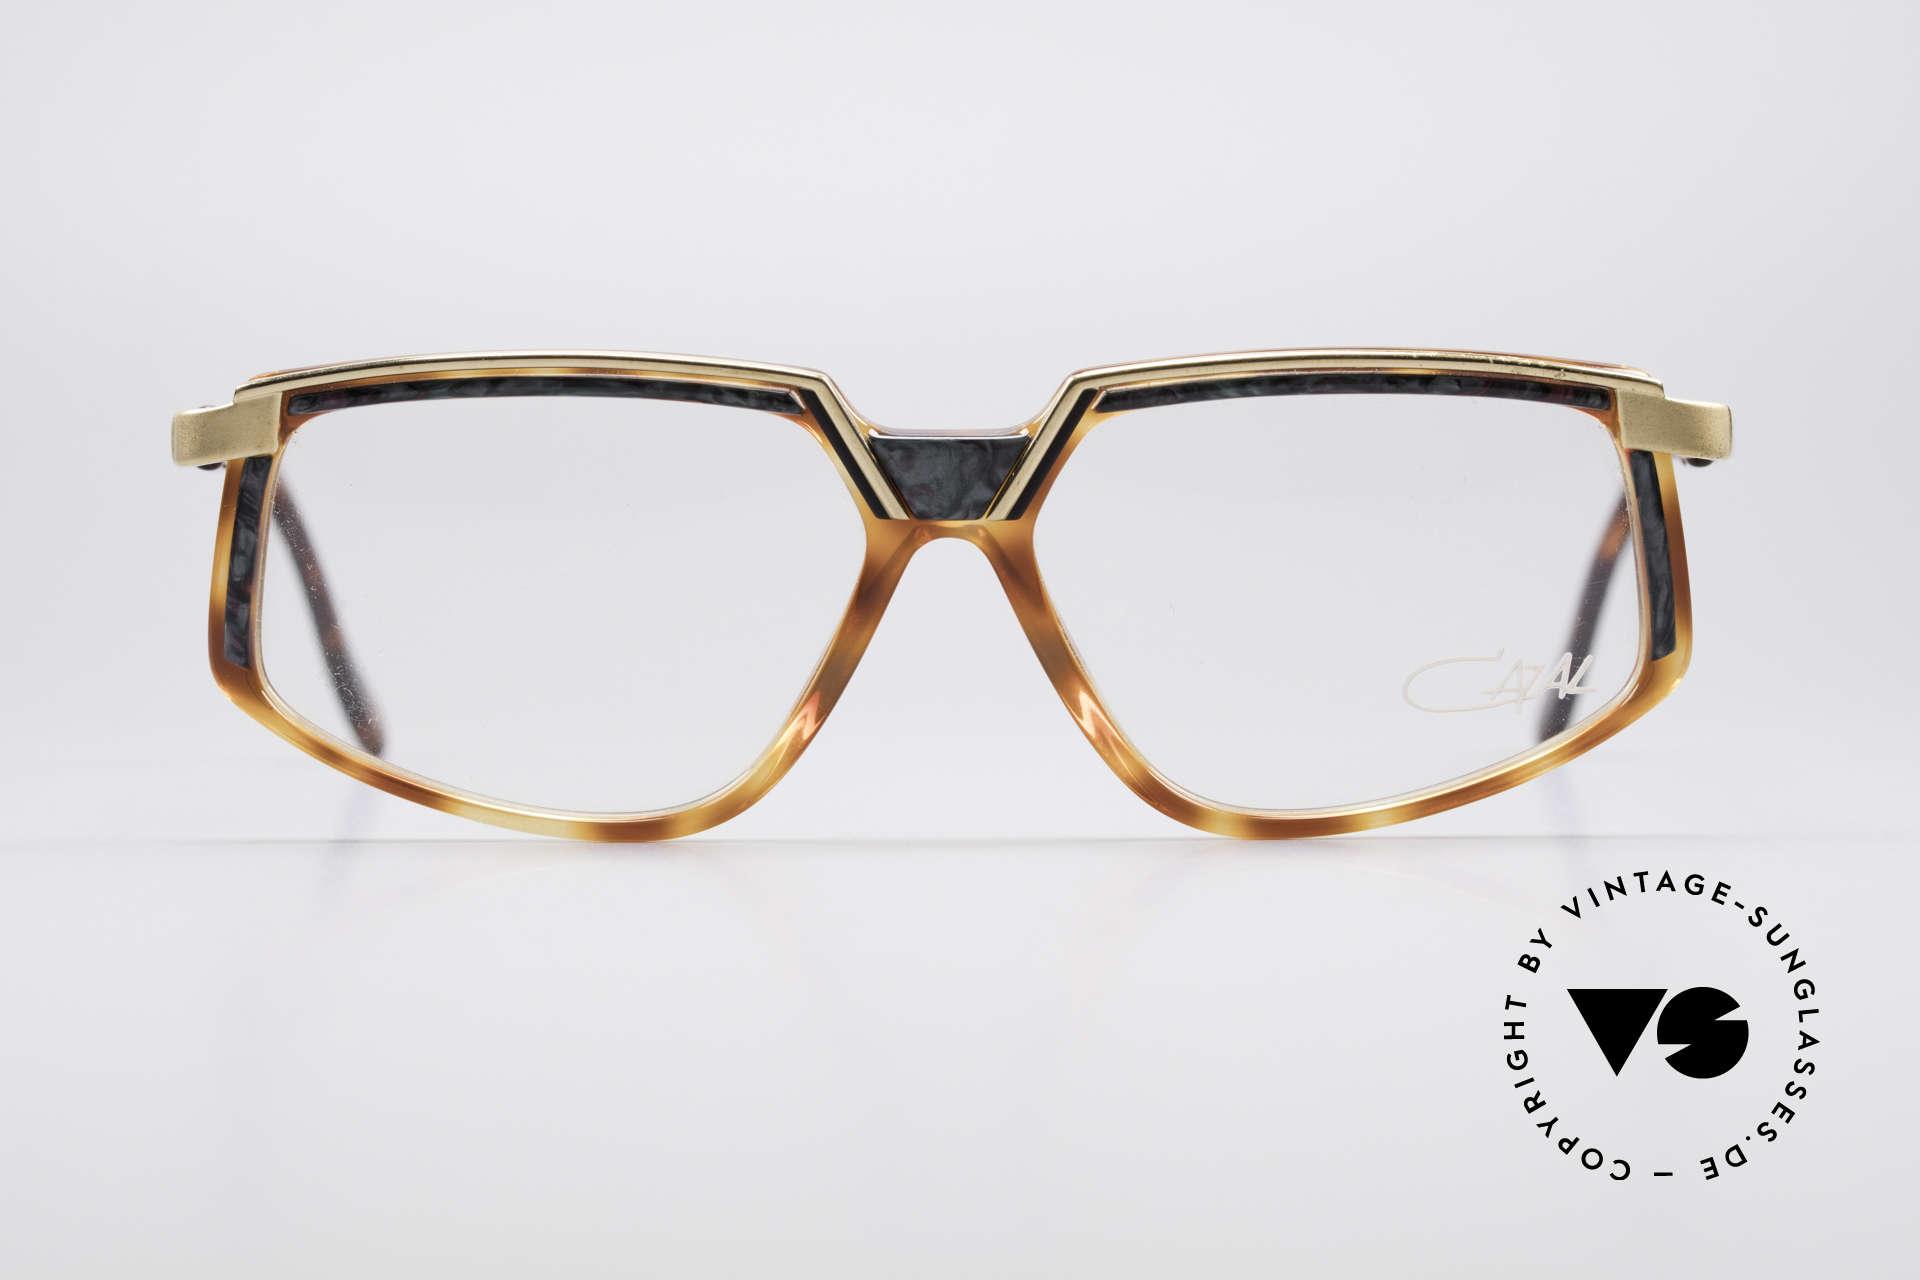 fef42dca90be Glasses cazal vintage frame no retro cazal vintage sunglasses jpg 1920x1280 Cazal  vintage frames